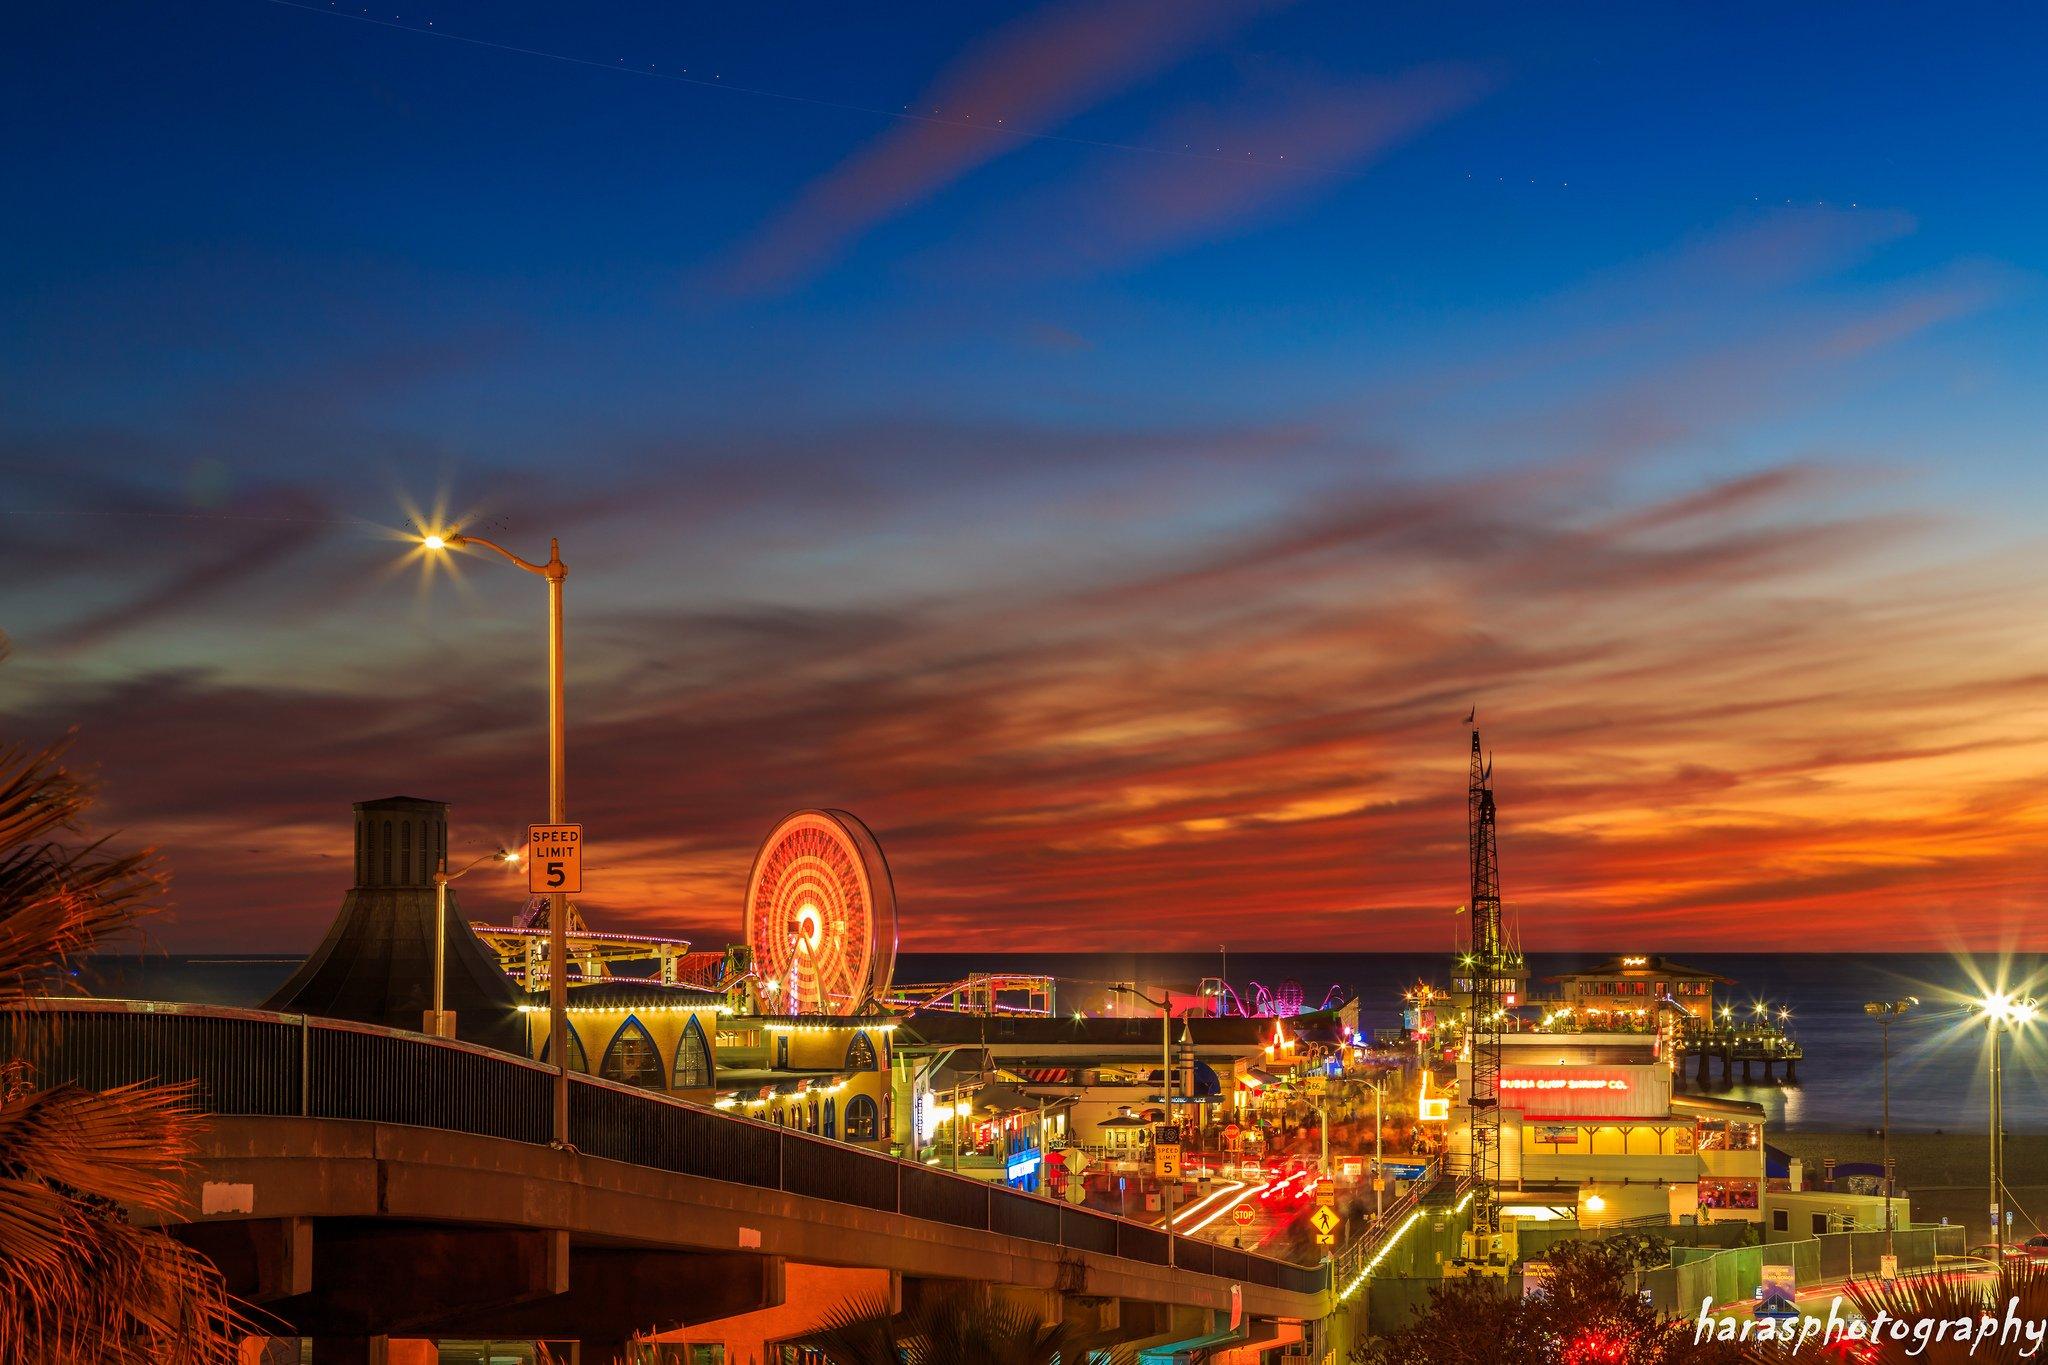 Venice Beach California at Sunset HD Wallpaper Background Image 2048x1365